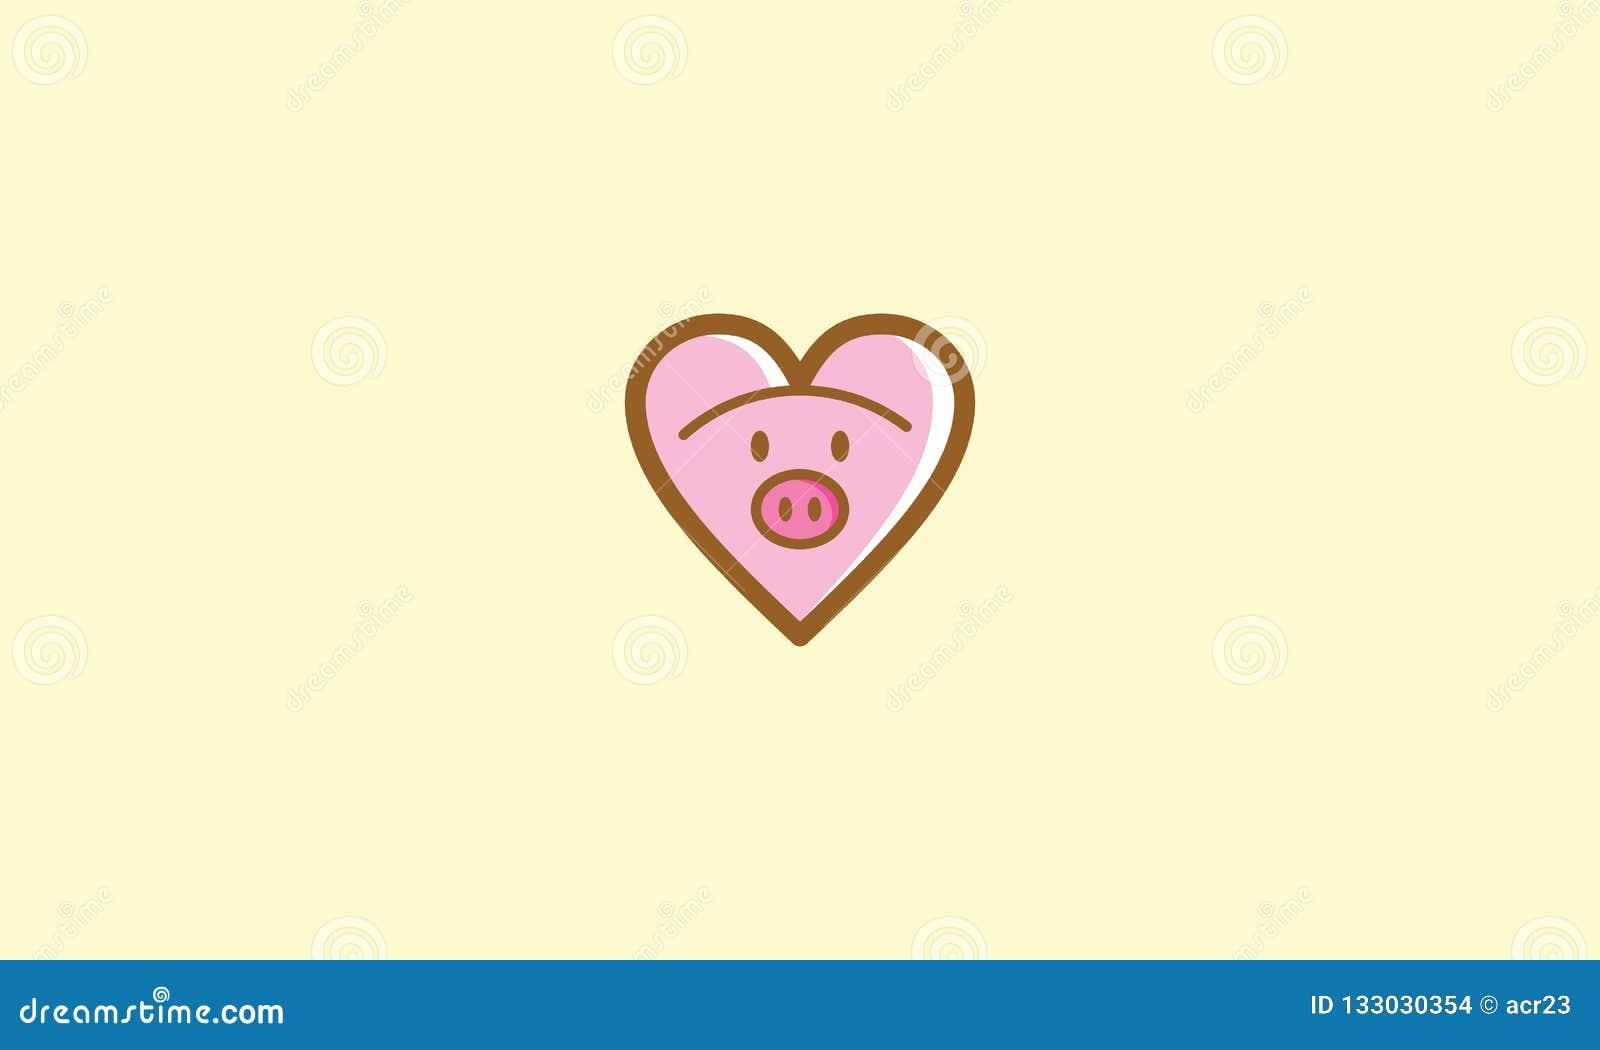 Love Cute Pig Logo Icon Vector Stock Vector Illustration Of Icon